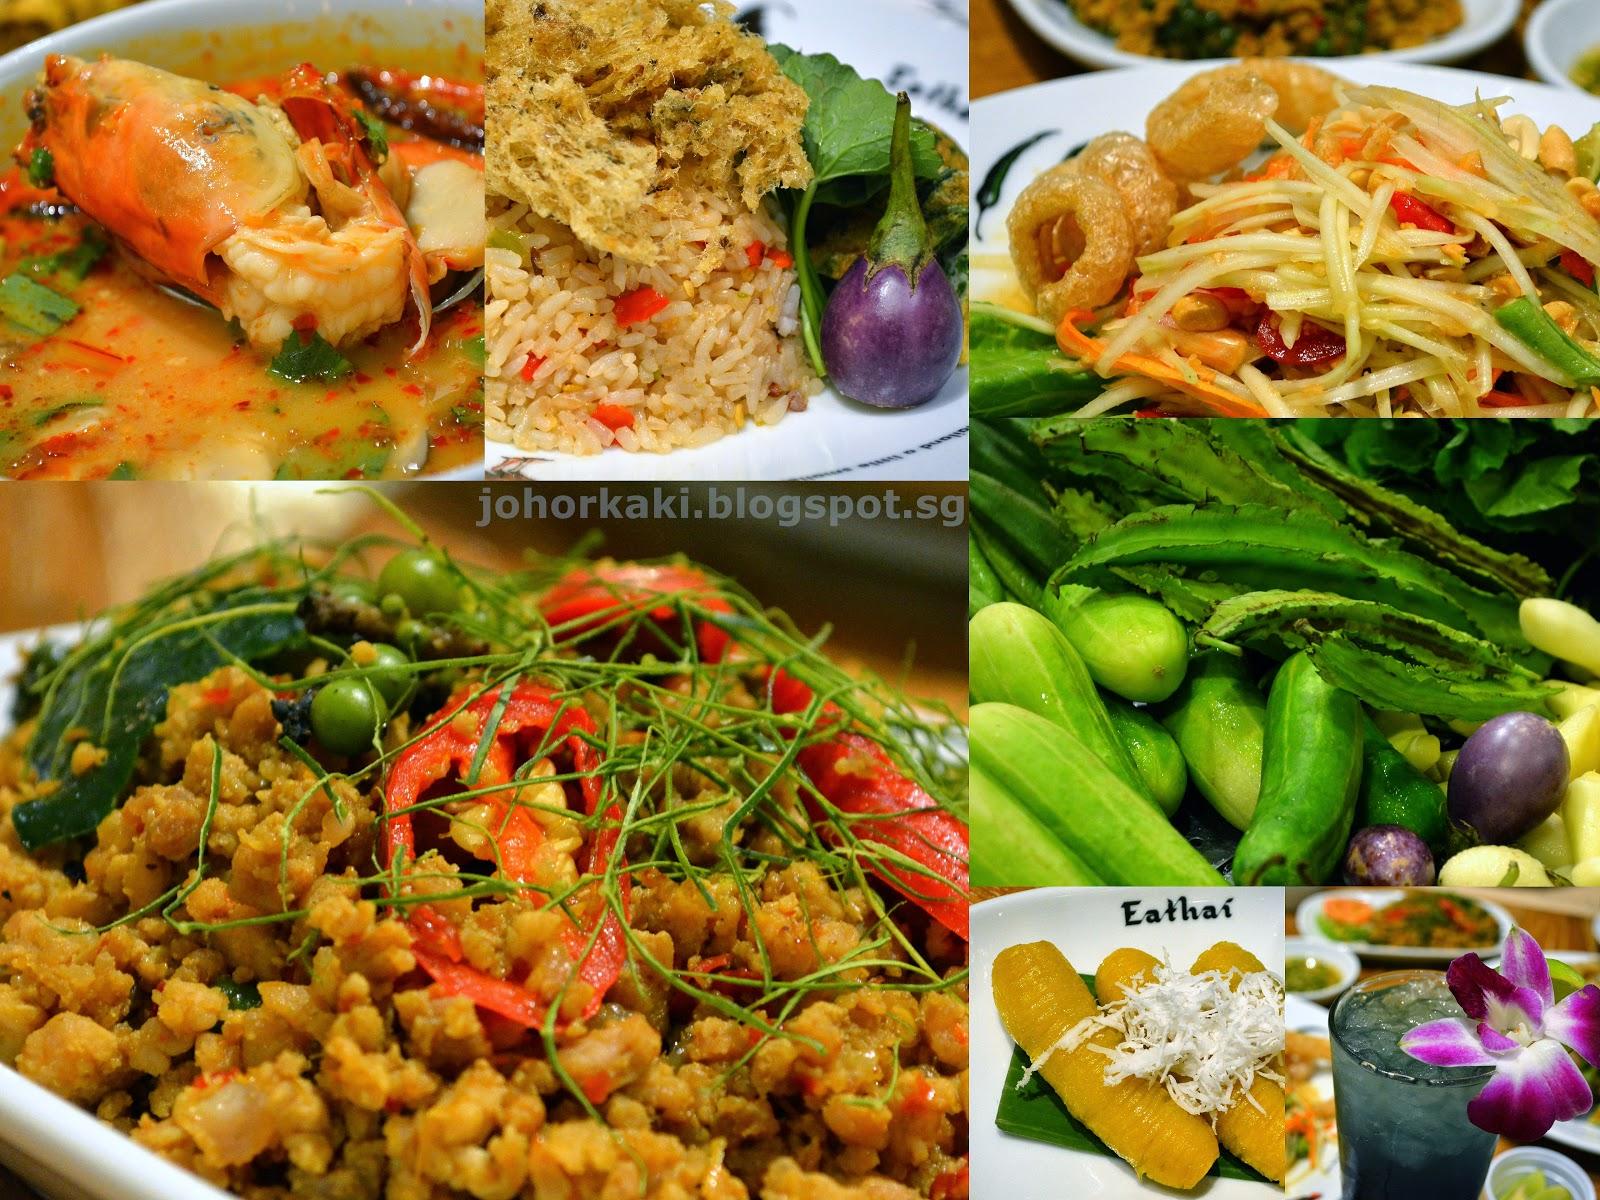 Eathai food at central embassy in bangkok johor kaki food for Cuisine kaki